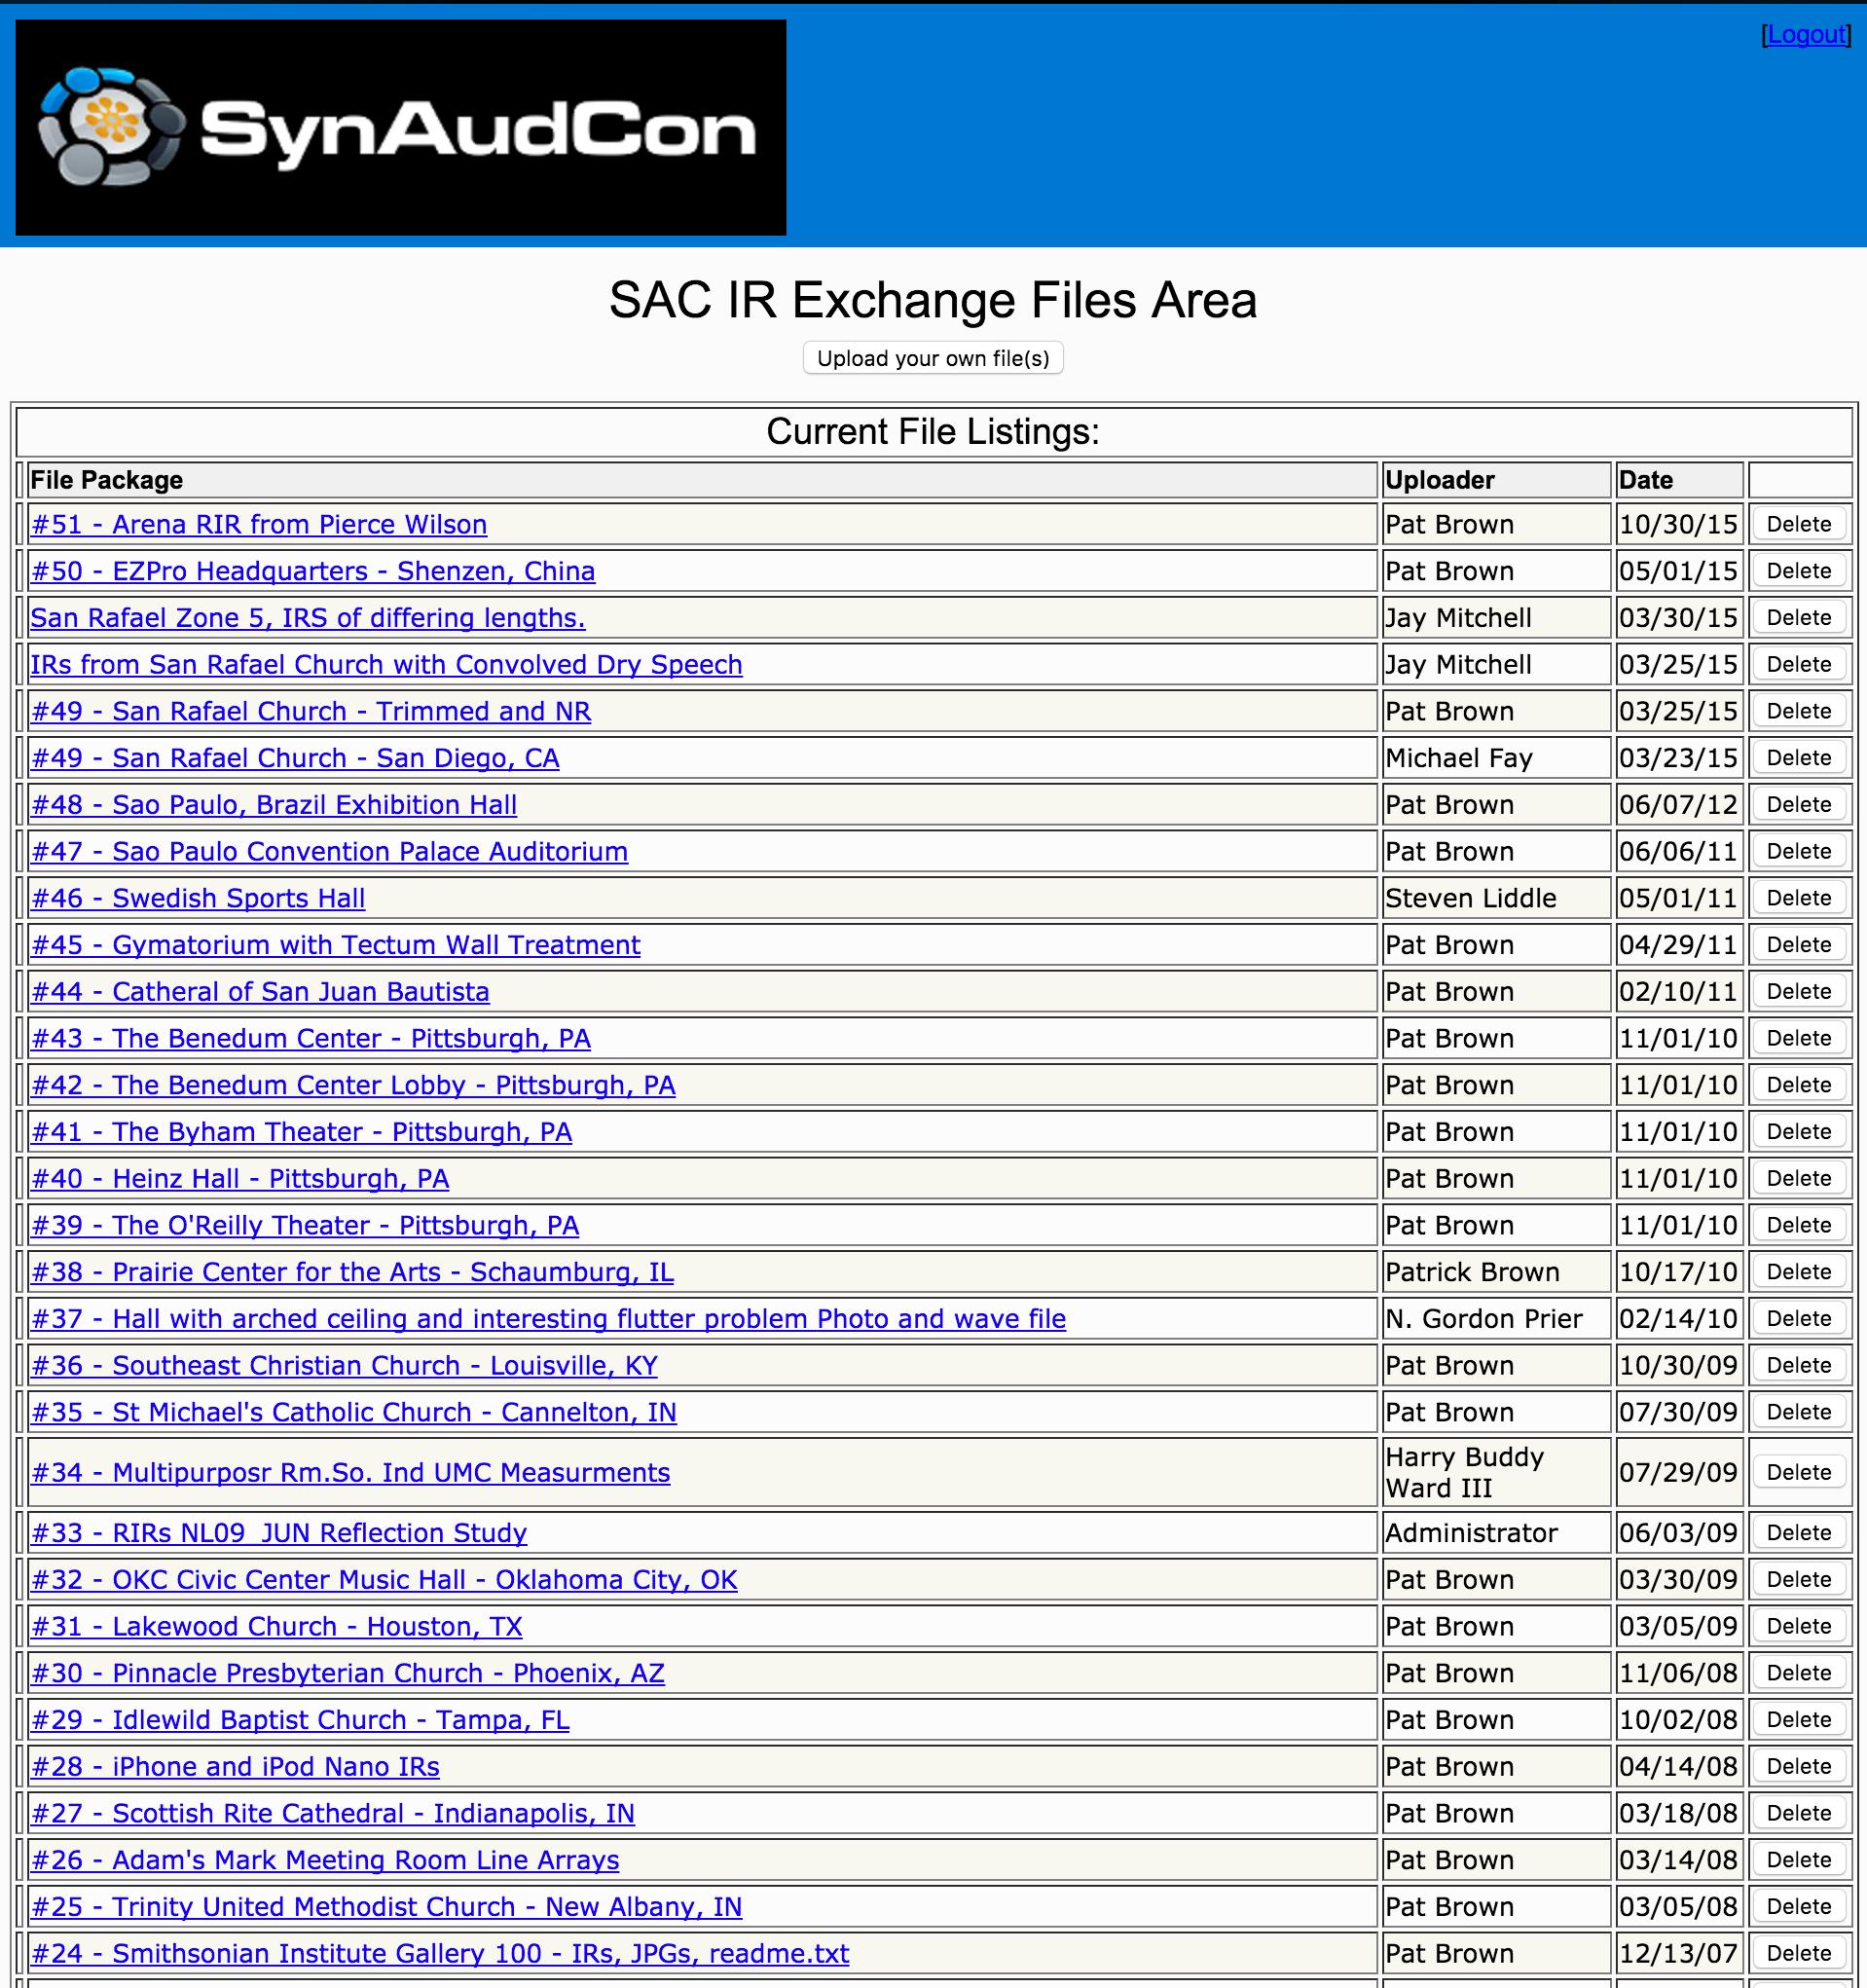 SynAudCon RIR Exchange List